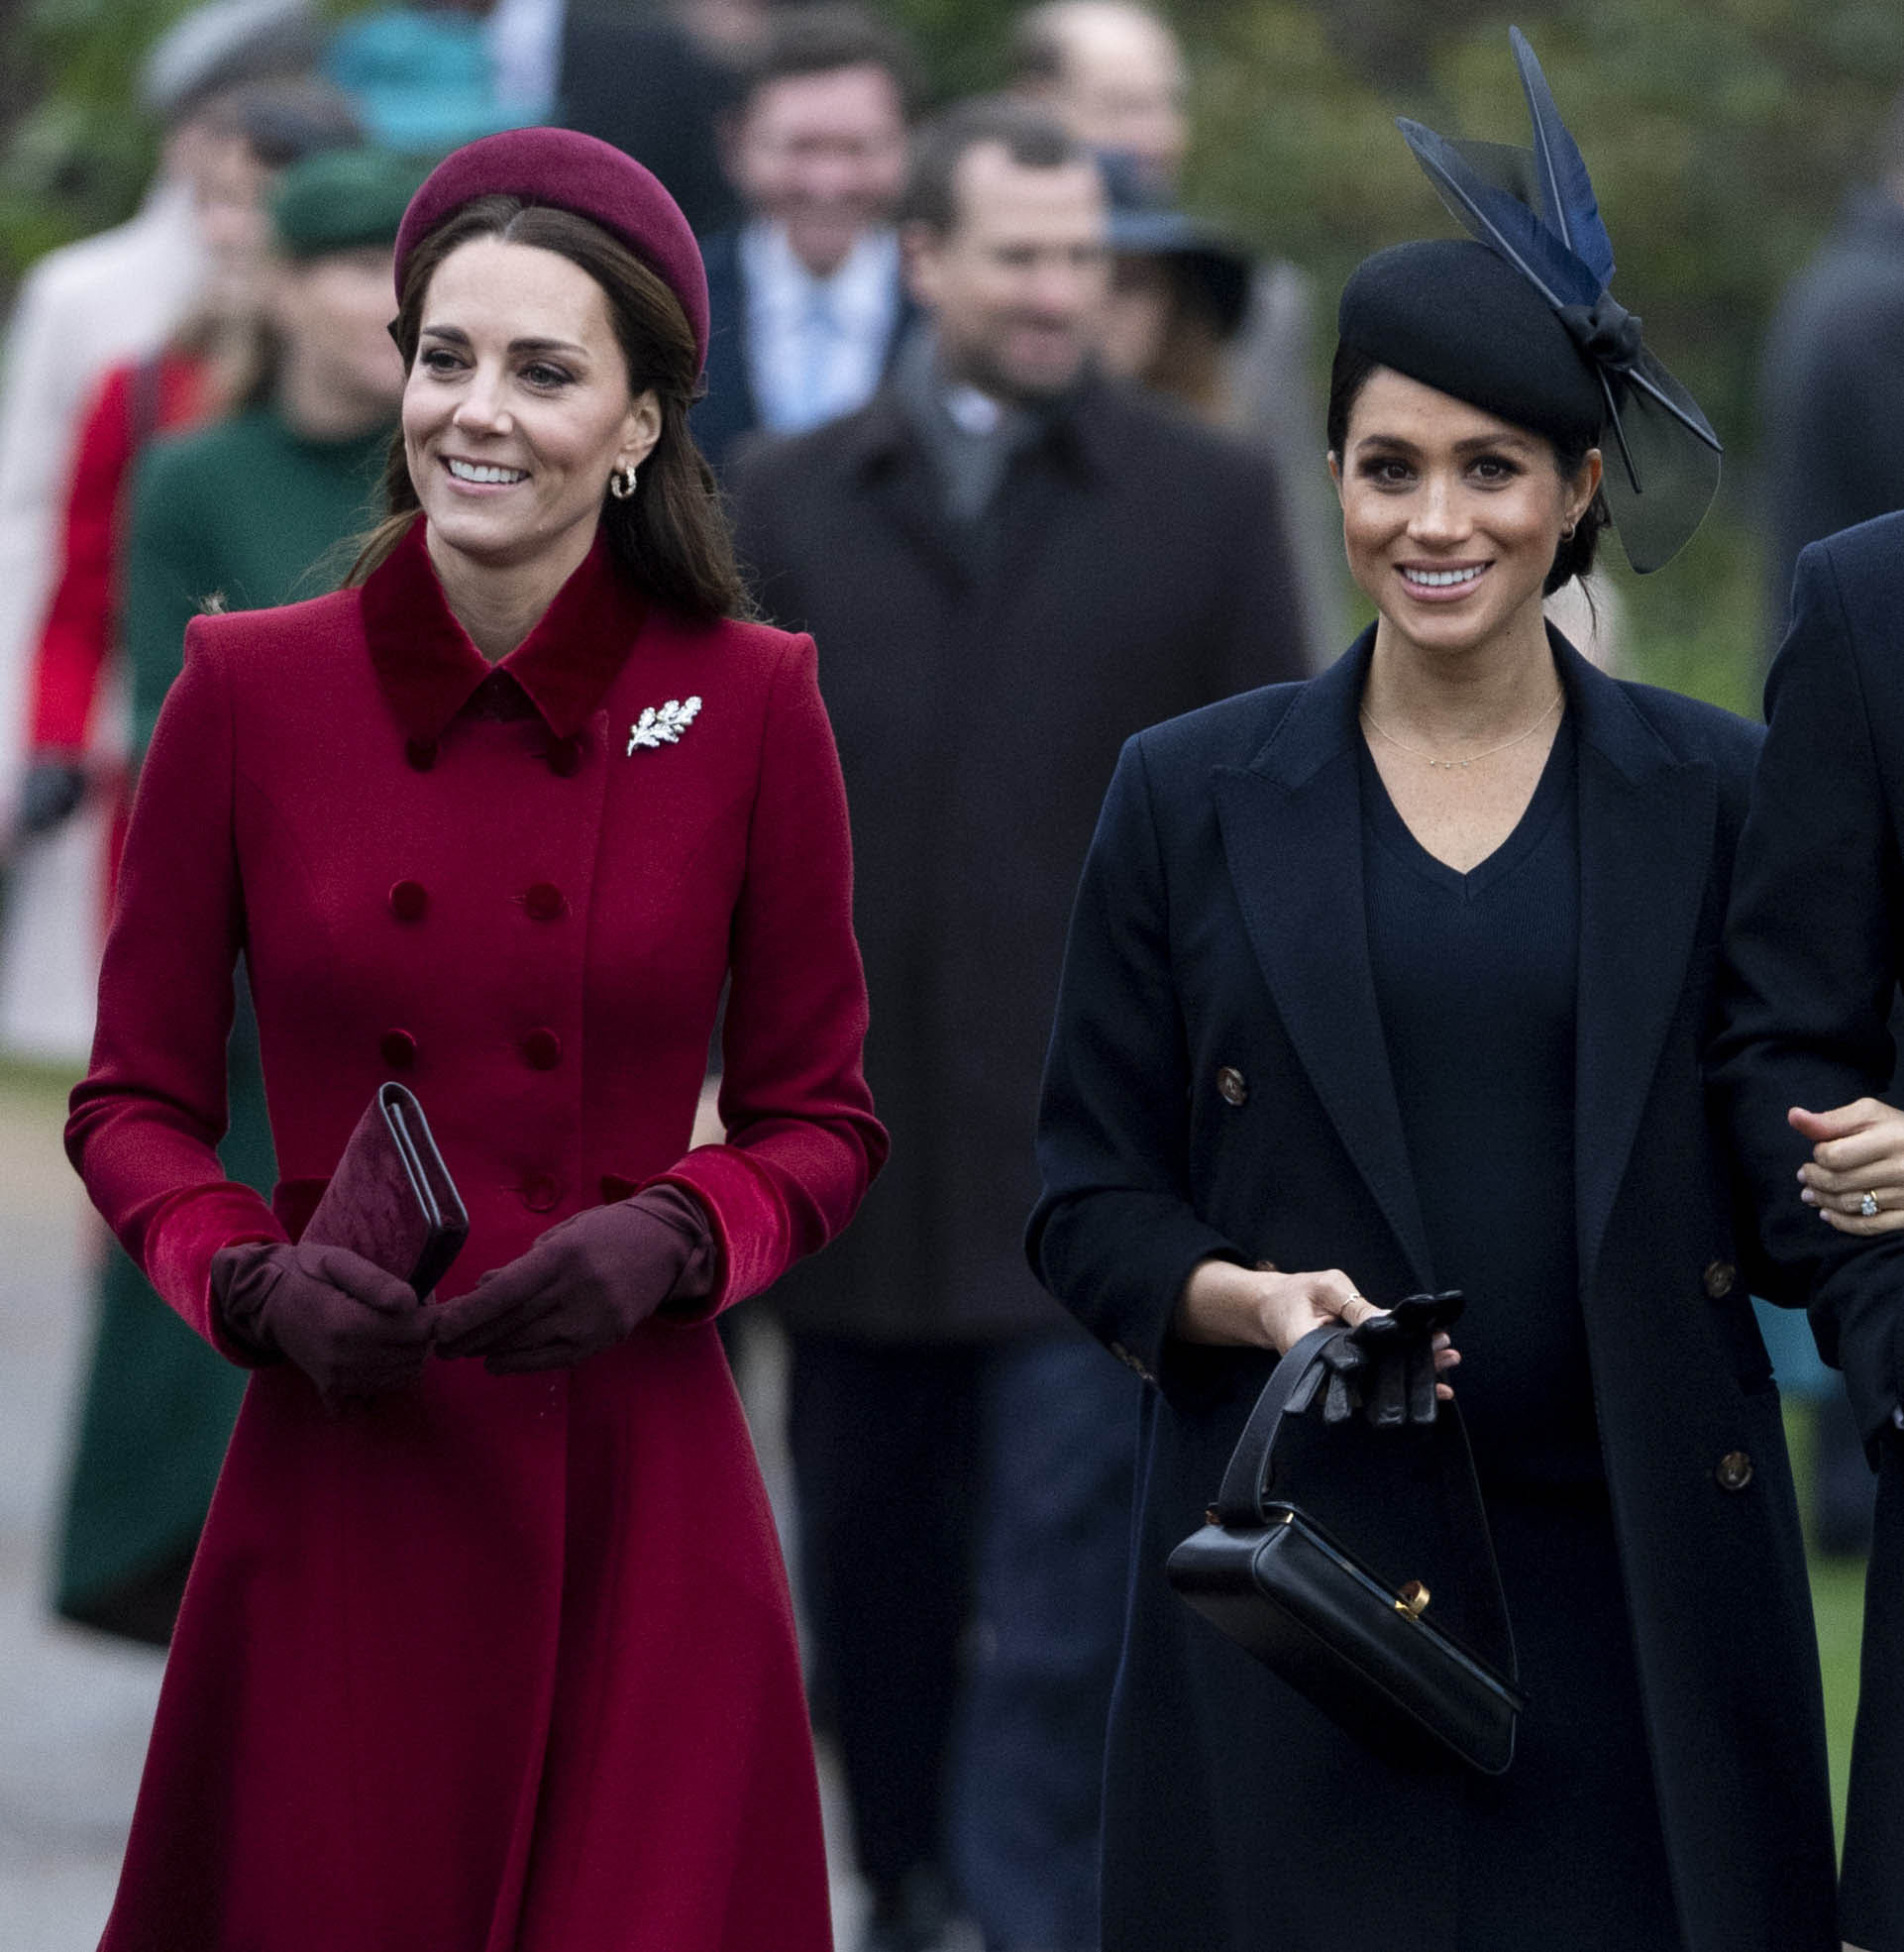 Photos of the British Royal Family Celebrating Christmas